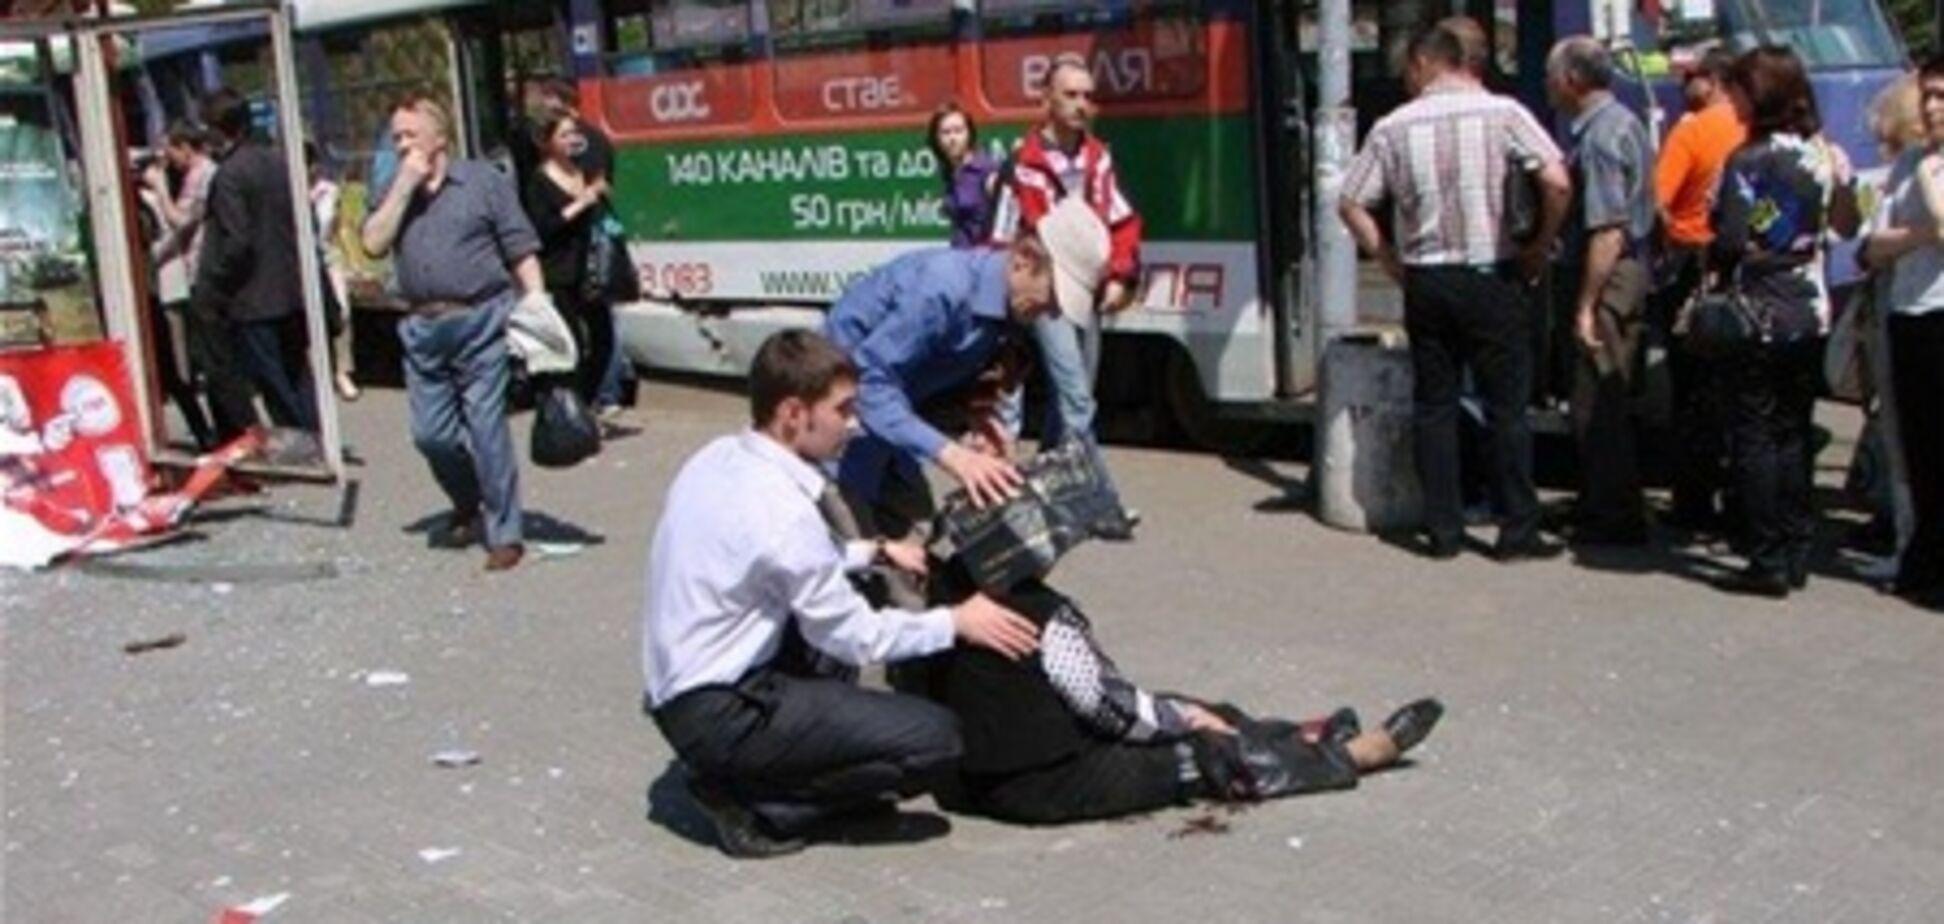 В Днепропетровске ходят слухи о 10 взрывах